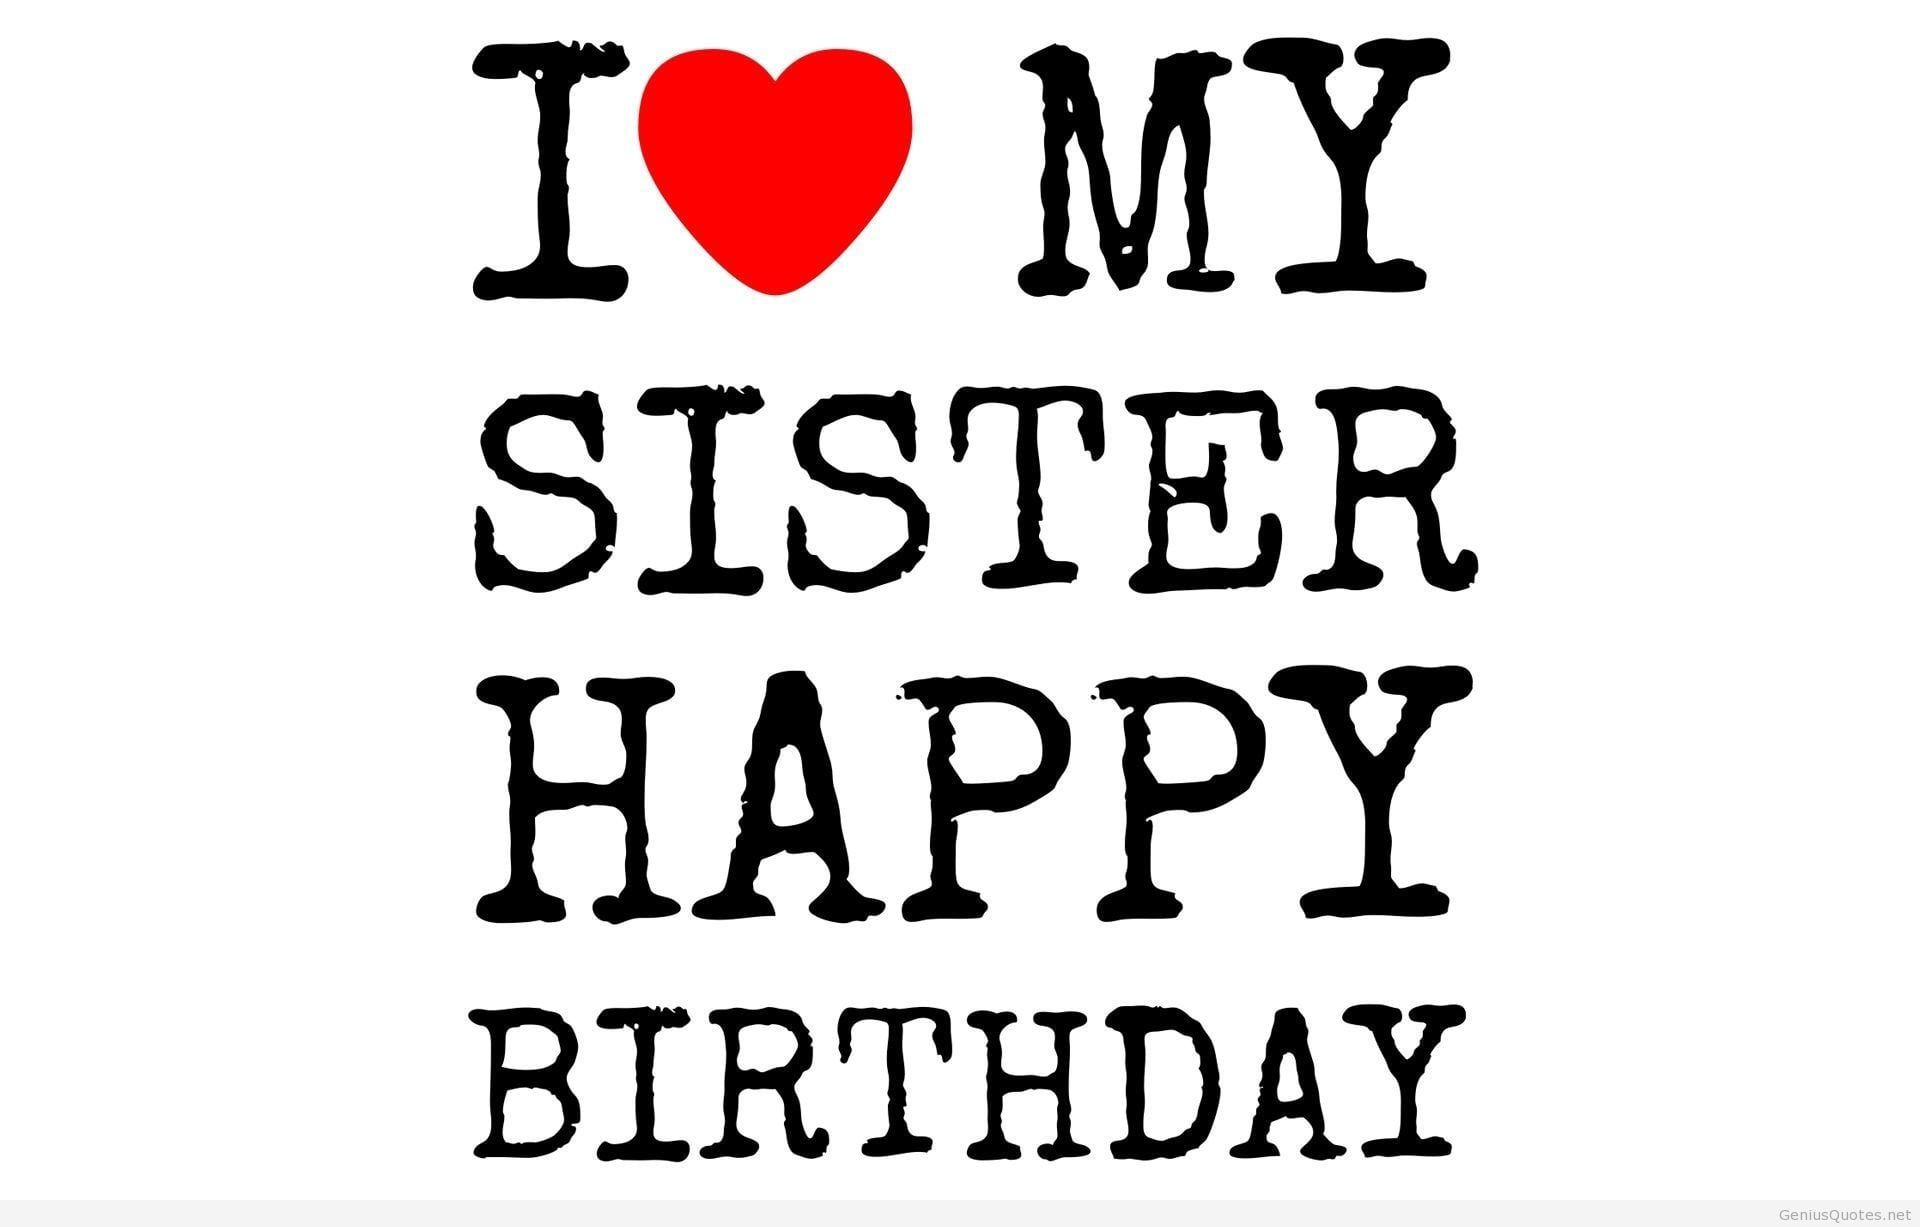 I Love My Sister Happy Birthday Birthday Wishes For Sister Happy Birthday Wishes Sister Sister Birthday Quotes